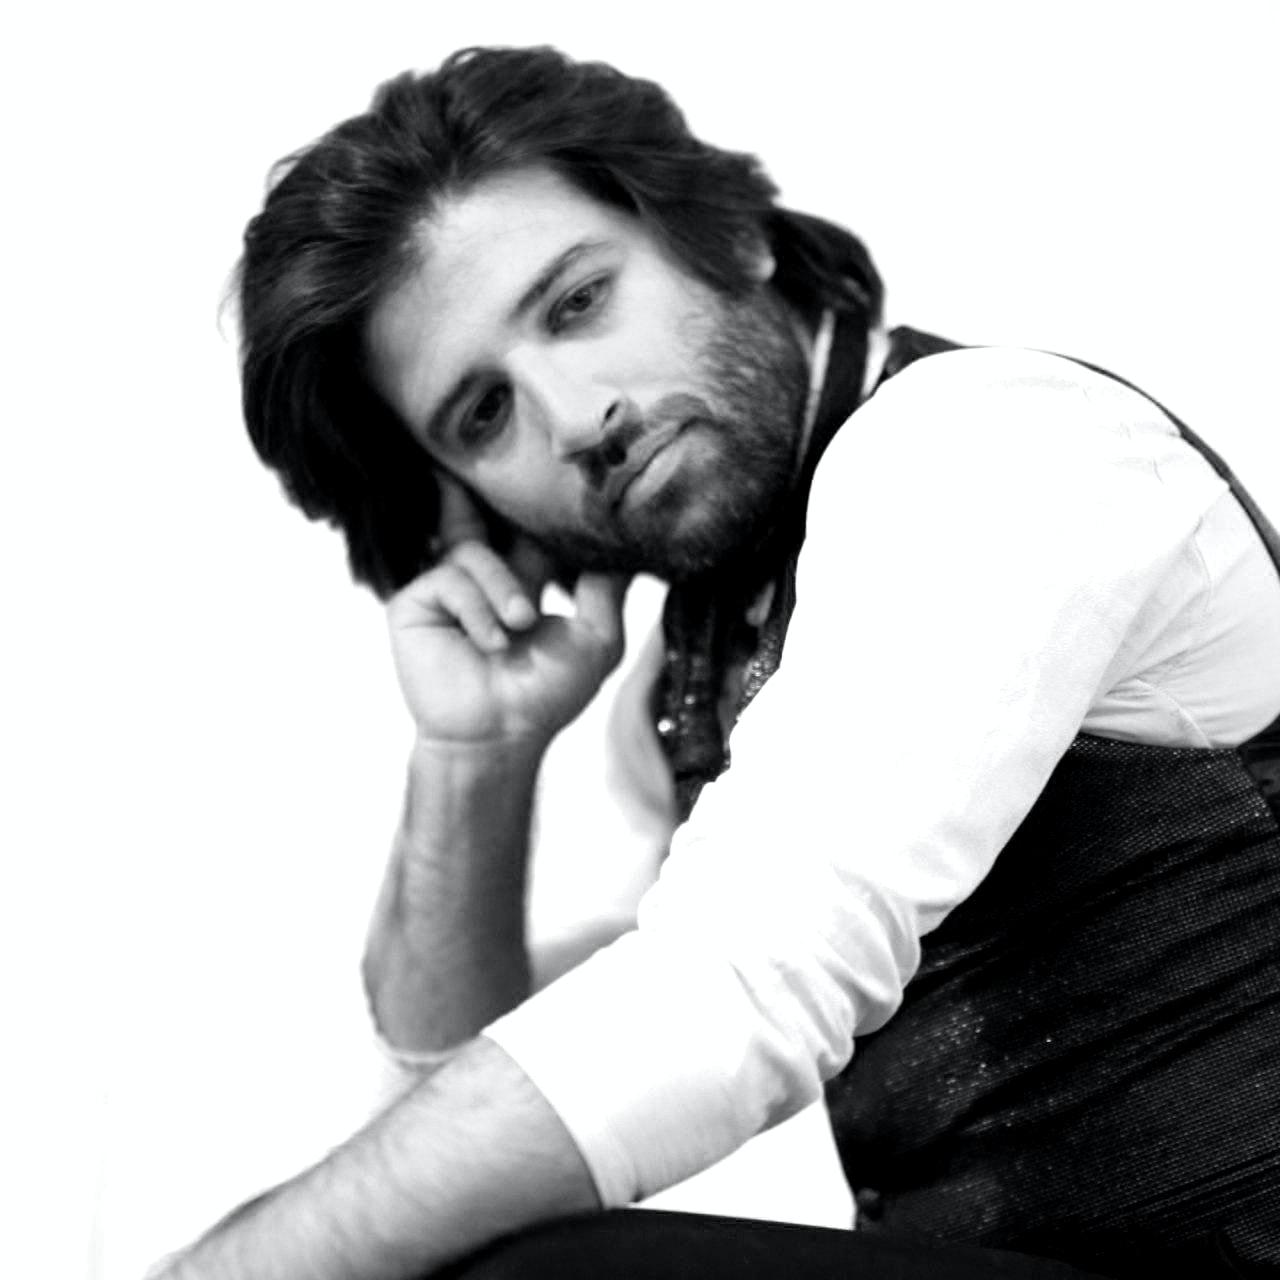 Go to Amin Hayati امین حیاتی's profile